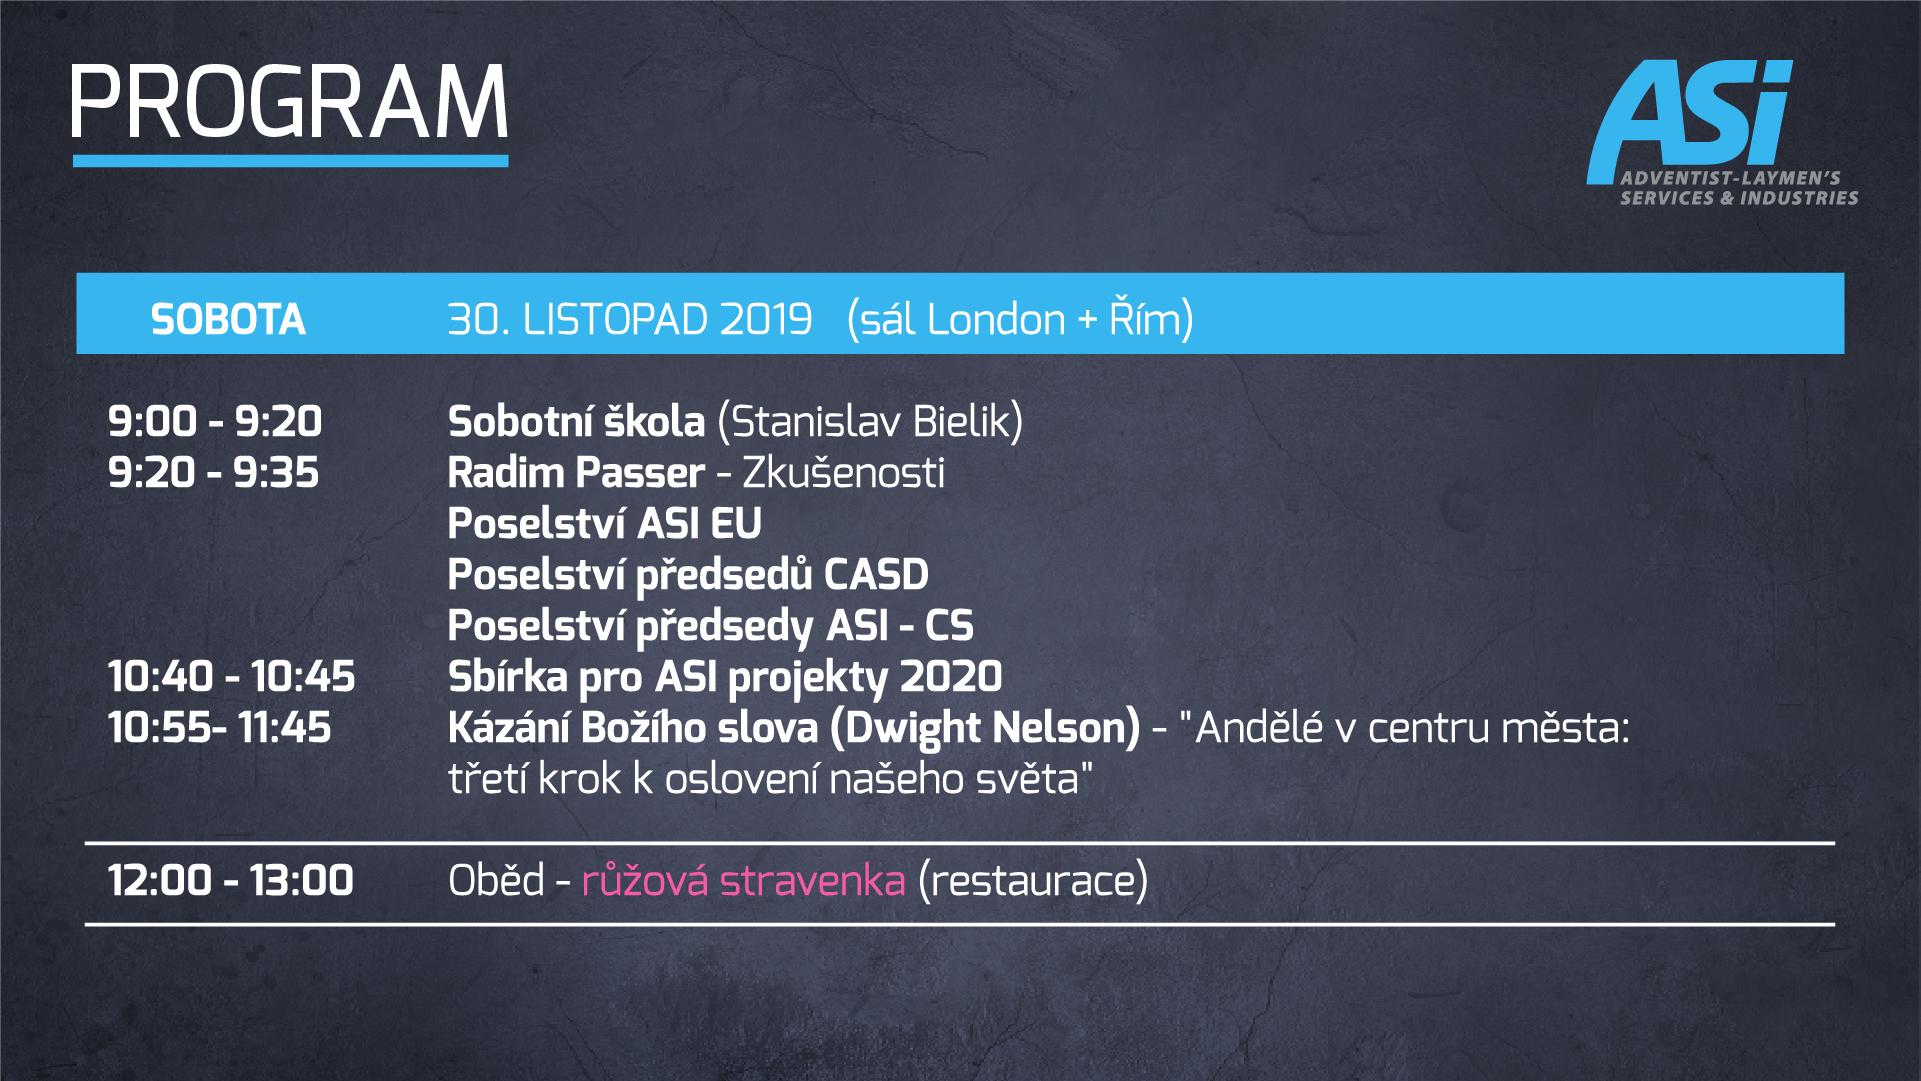 Program ASI Bratislava 4